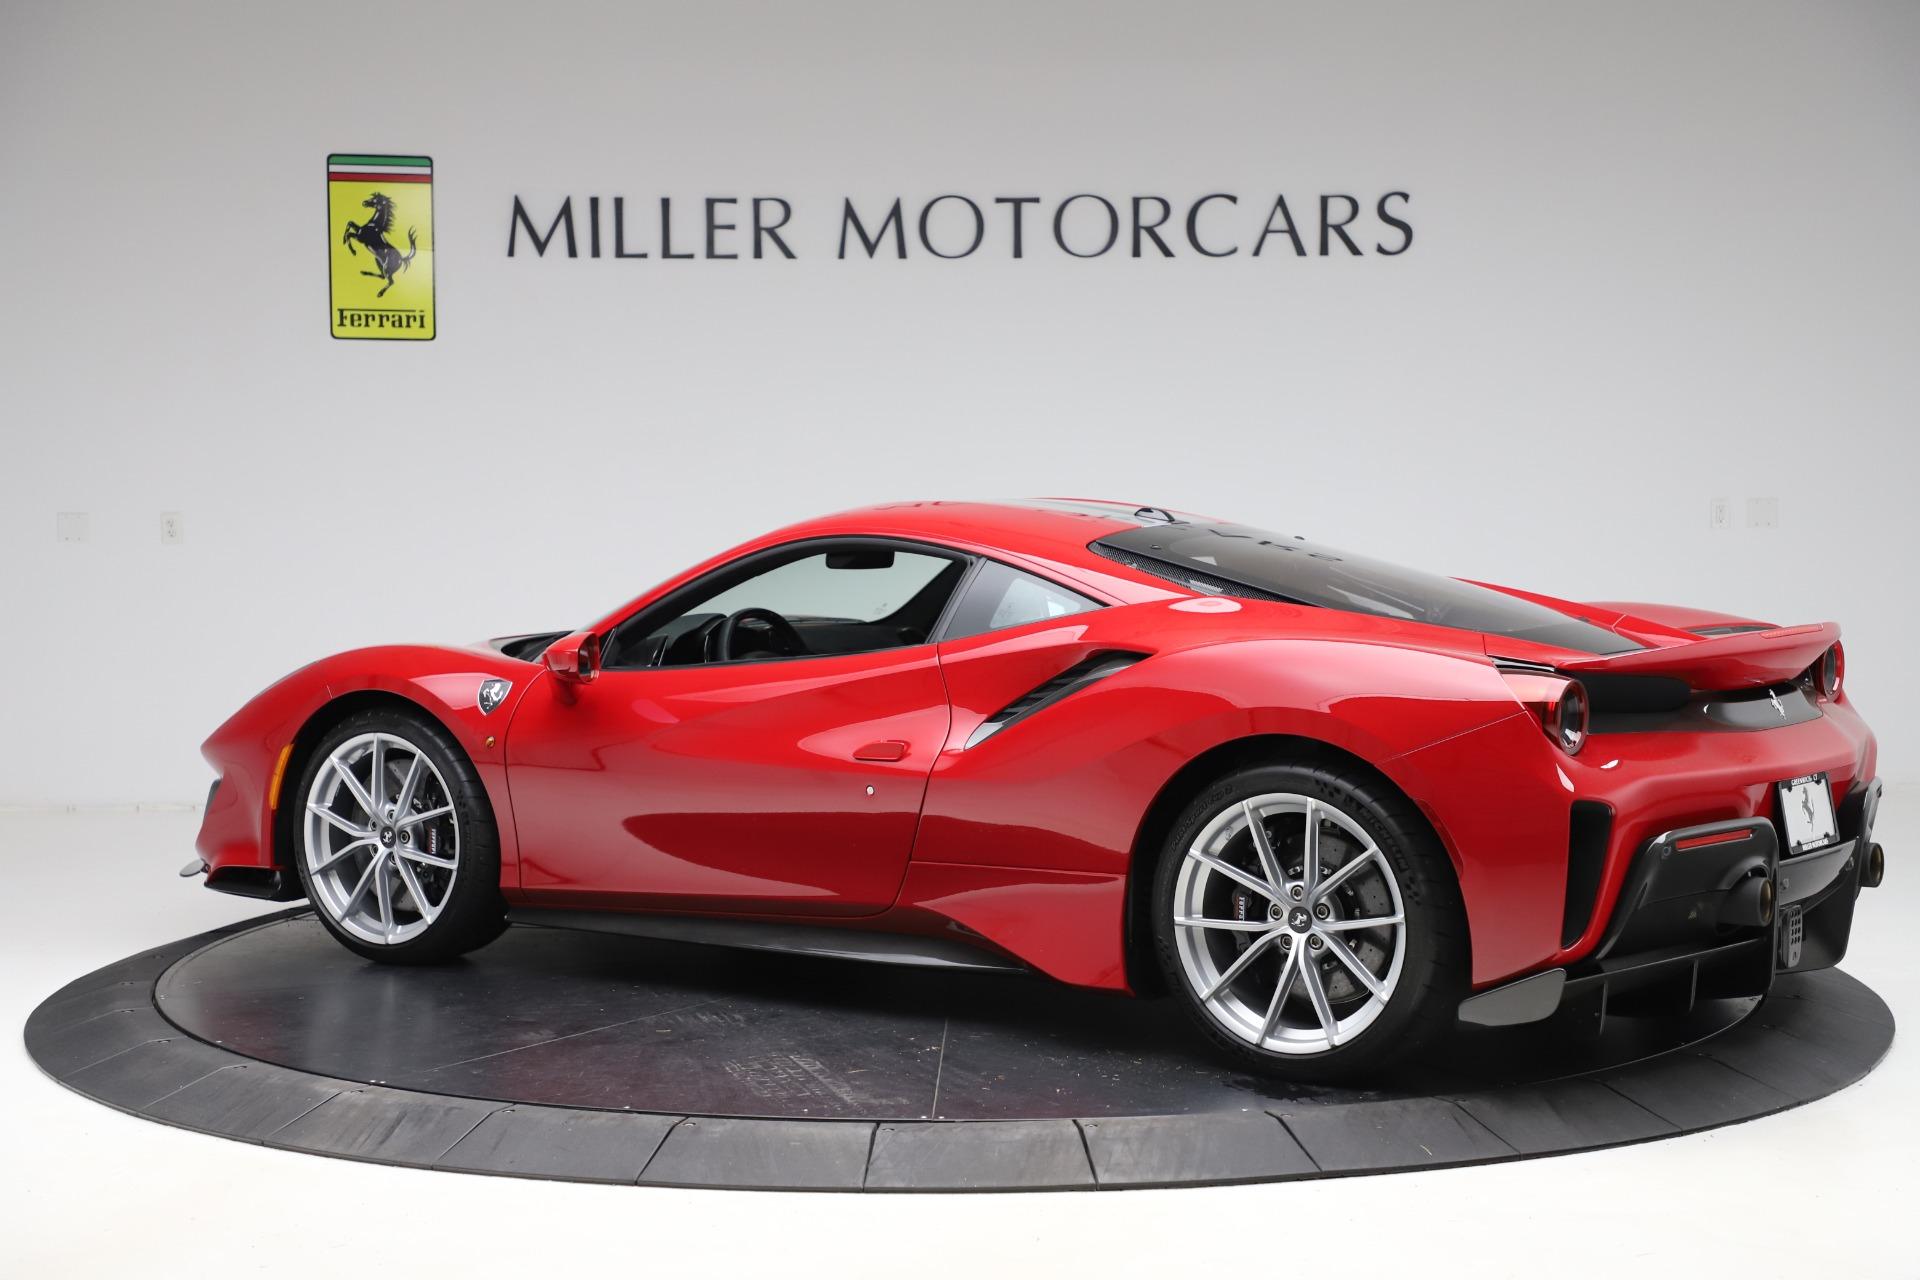 Pre-Owned 2020 Ferrari 488 Pista For Sale | Ferrari of ...